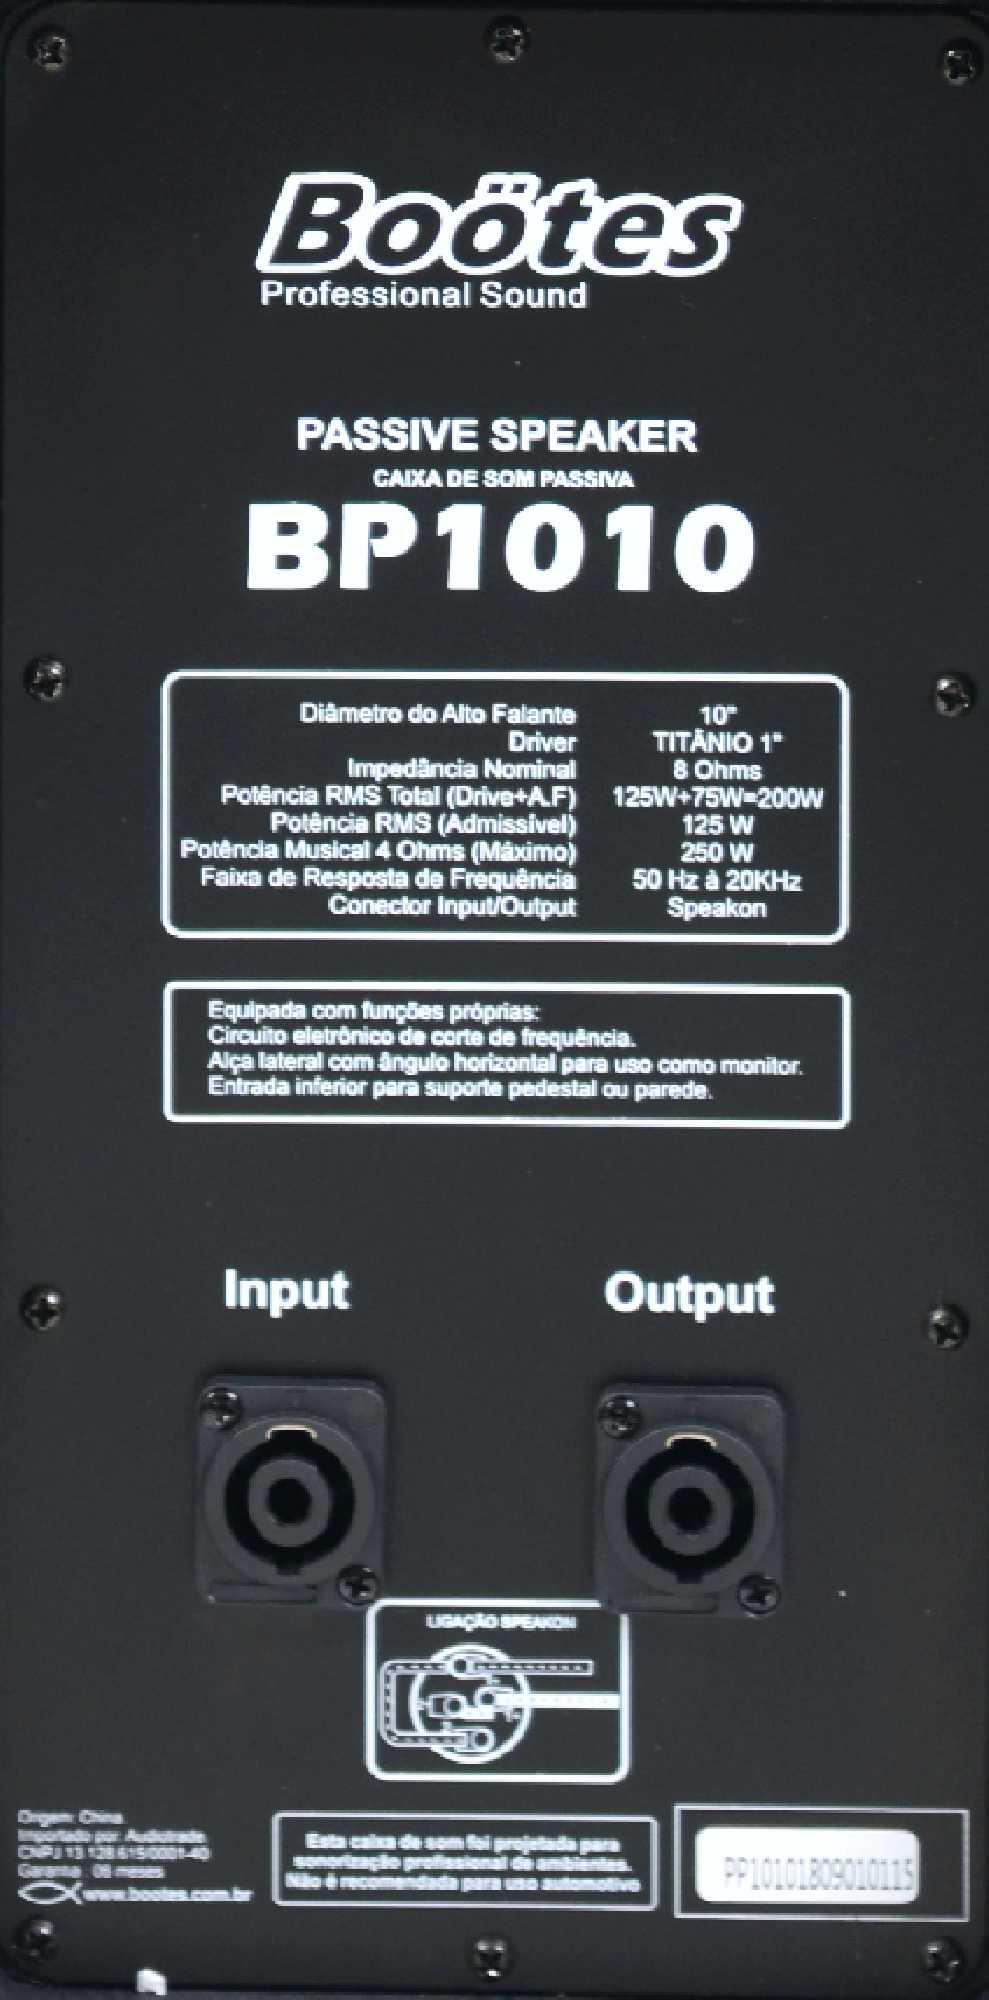 CAIXA DE SOM PASSIVA BOOTES BP-1010  A.F. 10 POL+DTI  250W/MUS  - Audio Video & cia